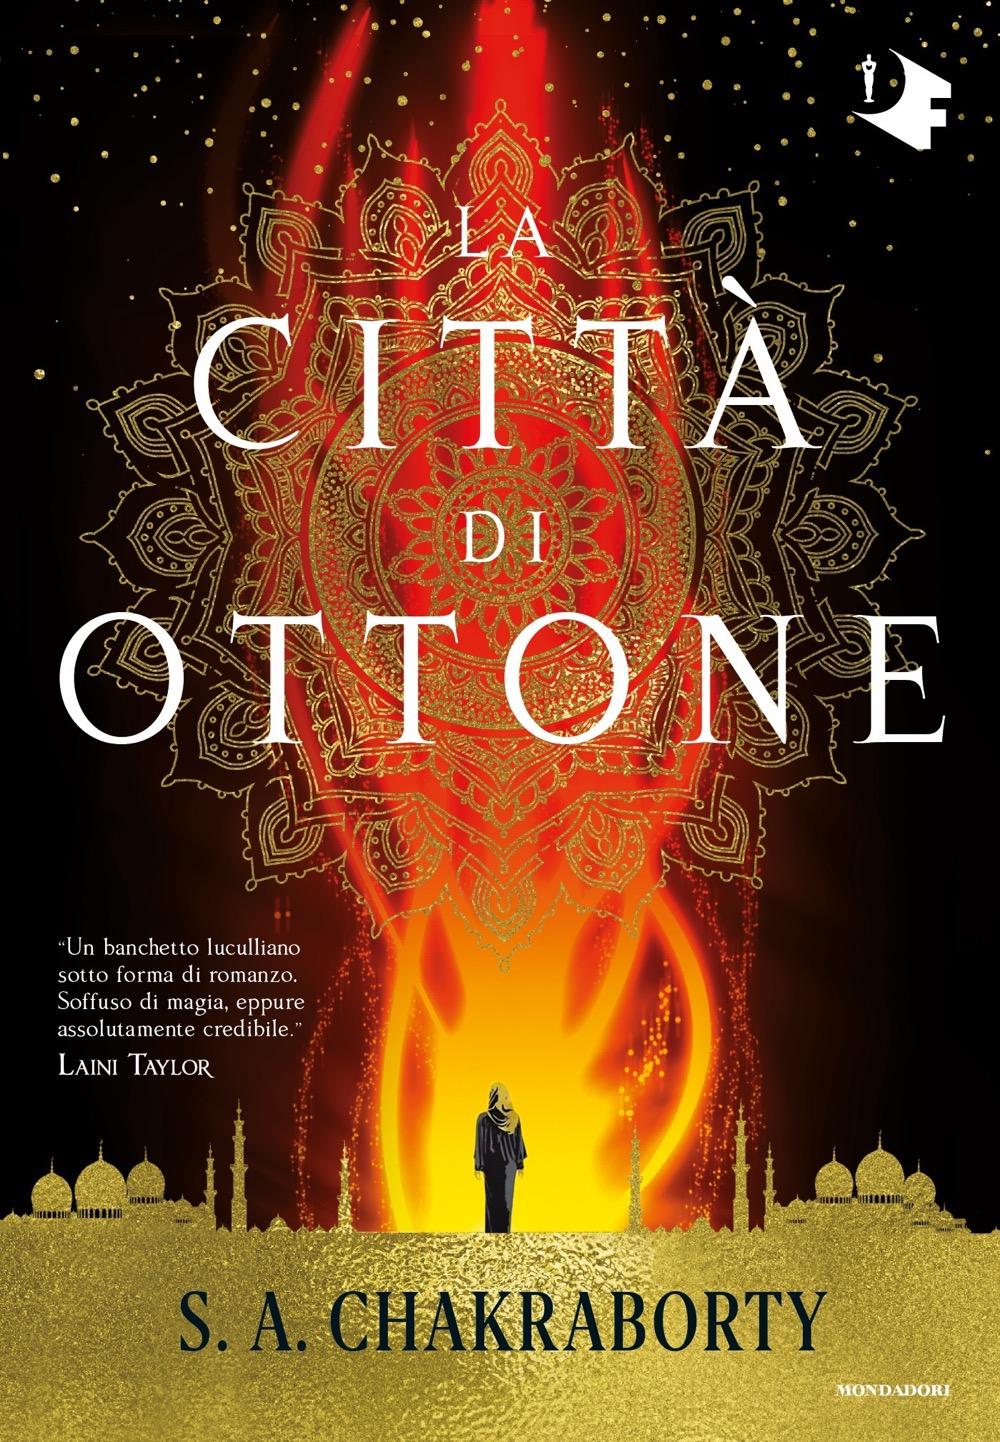 La città di ottone - S. A. Chakraborty | Oscar Mondadori